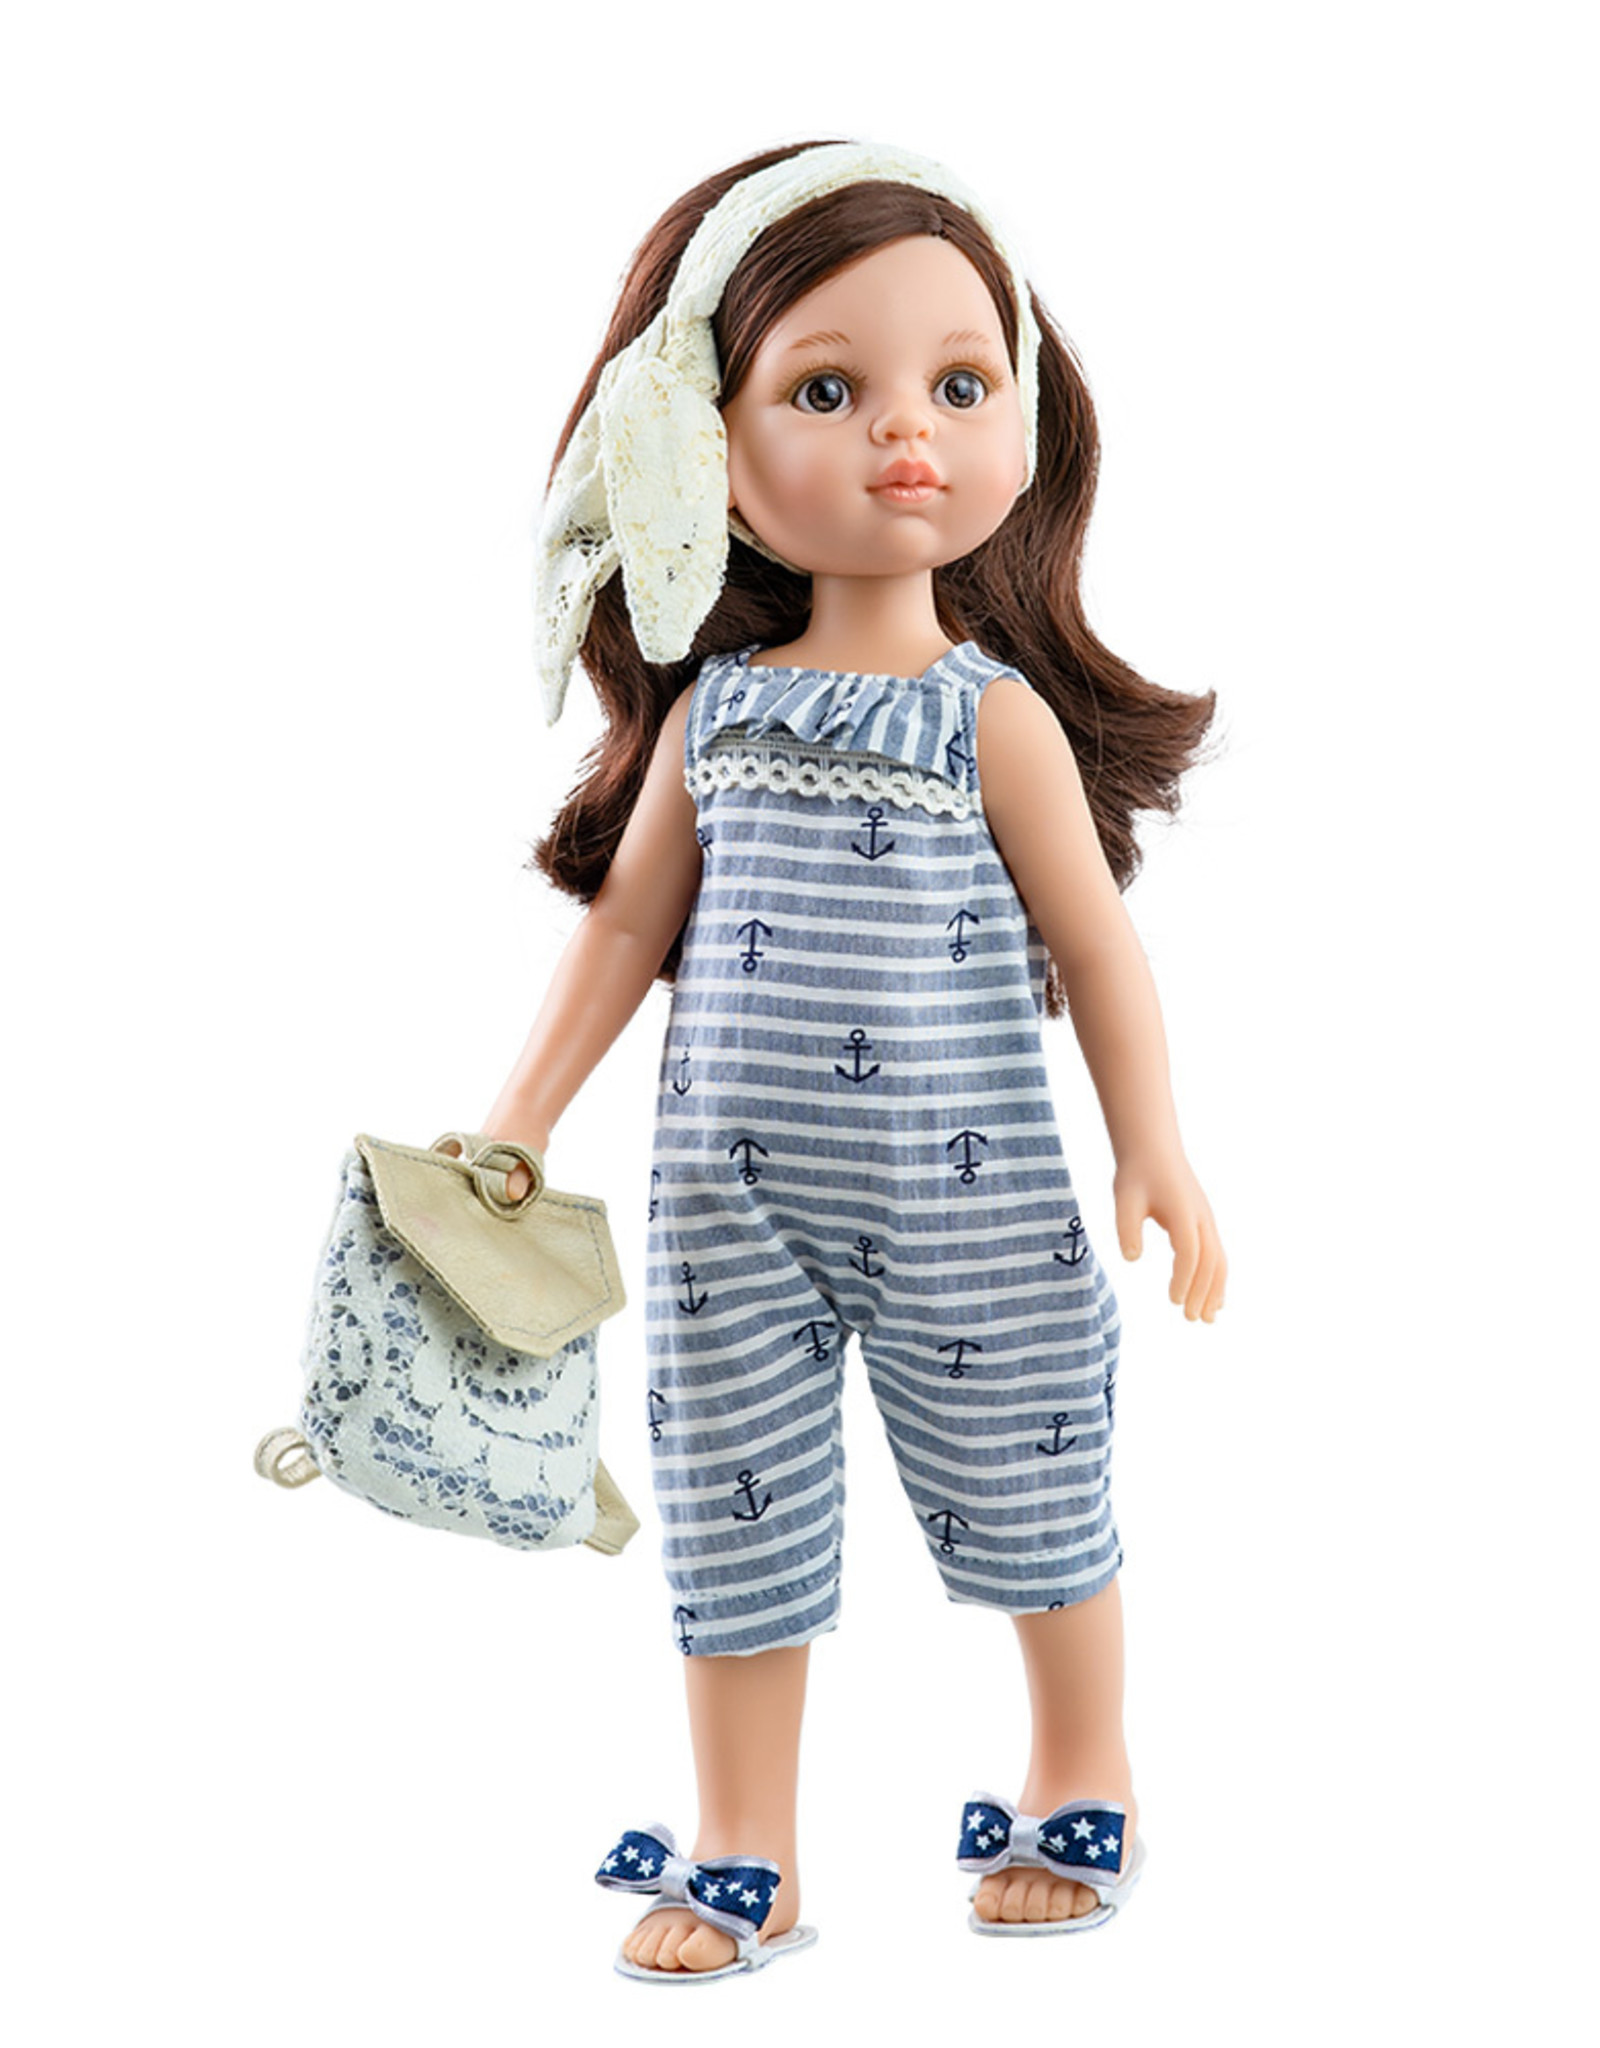 Paola Reina Paola Reina - Carol Doll 32cm (4434)